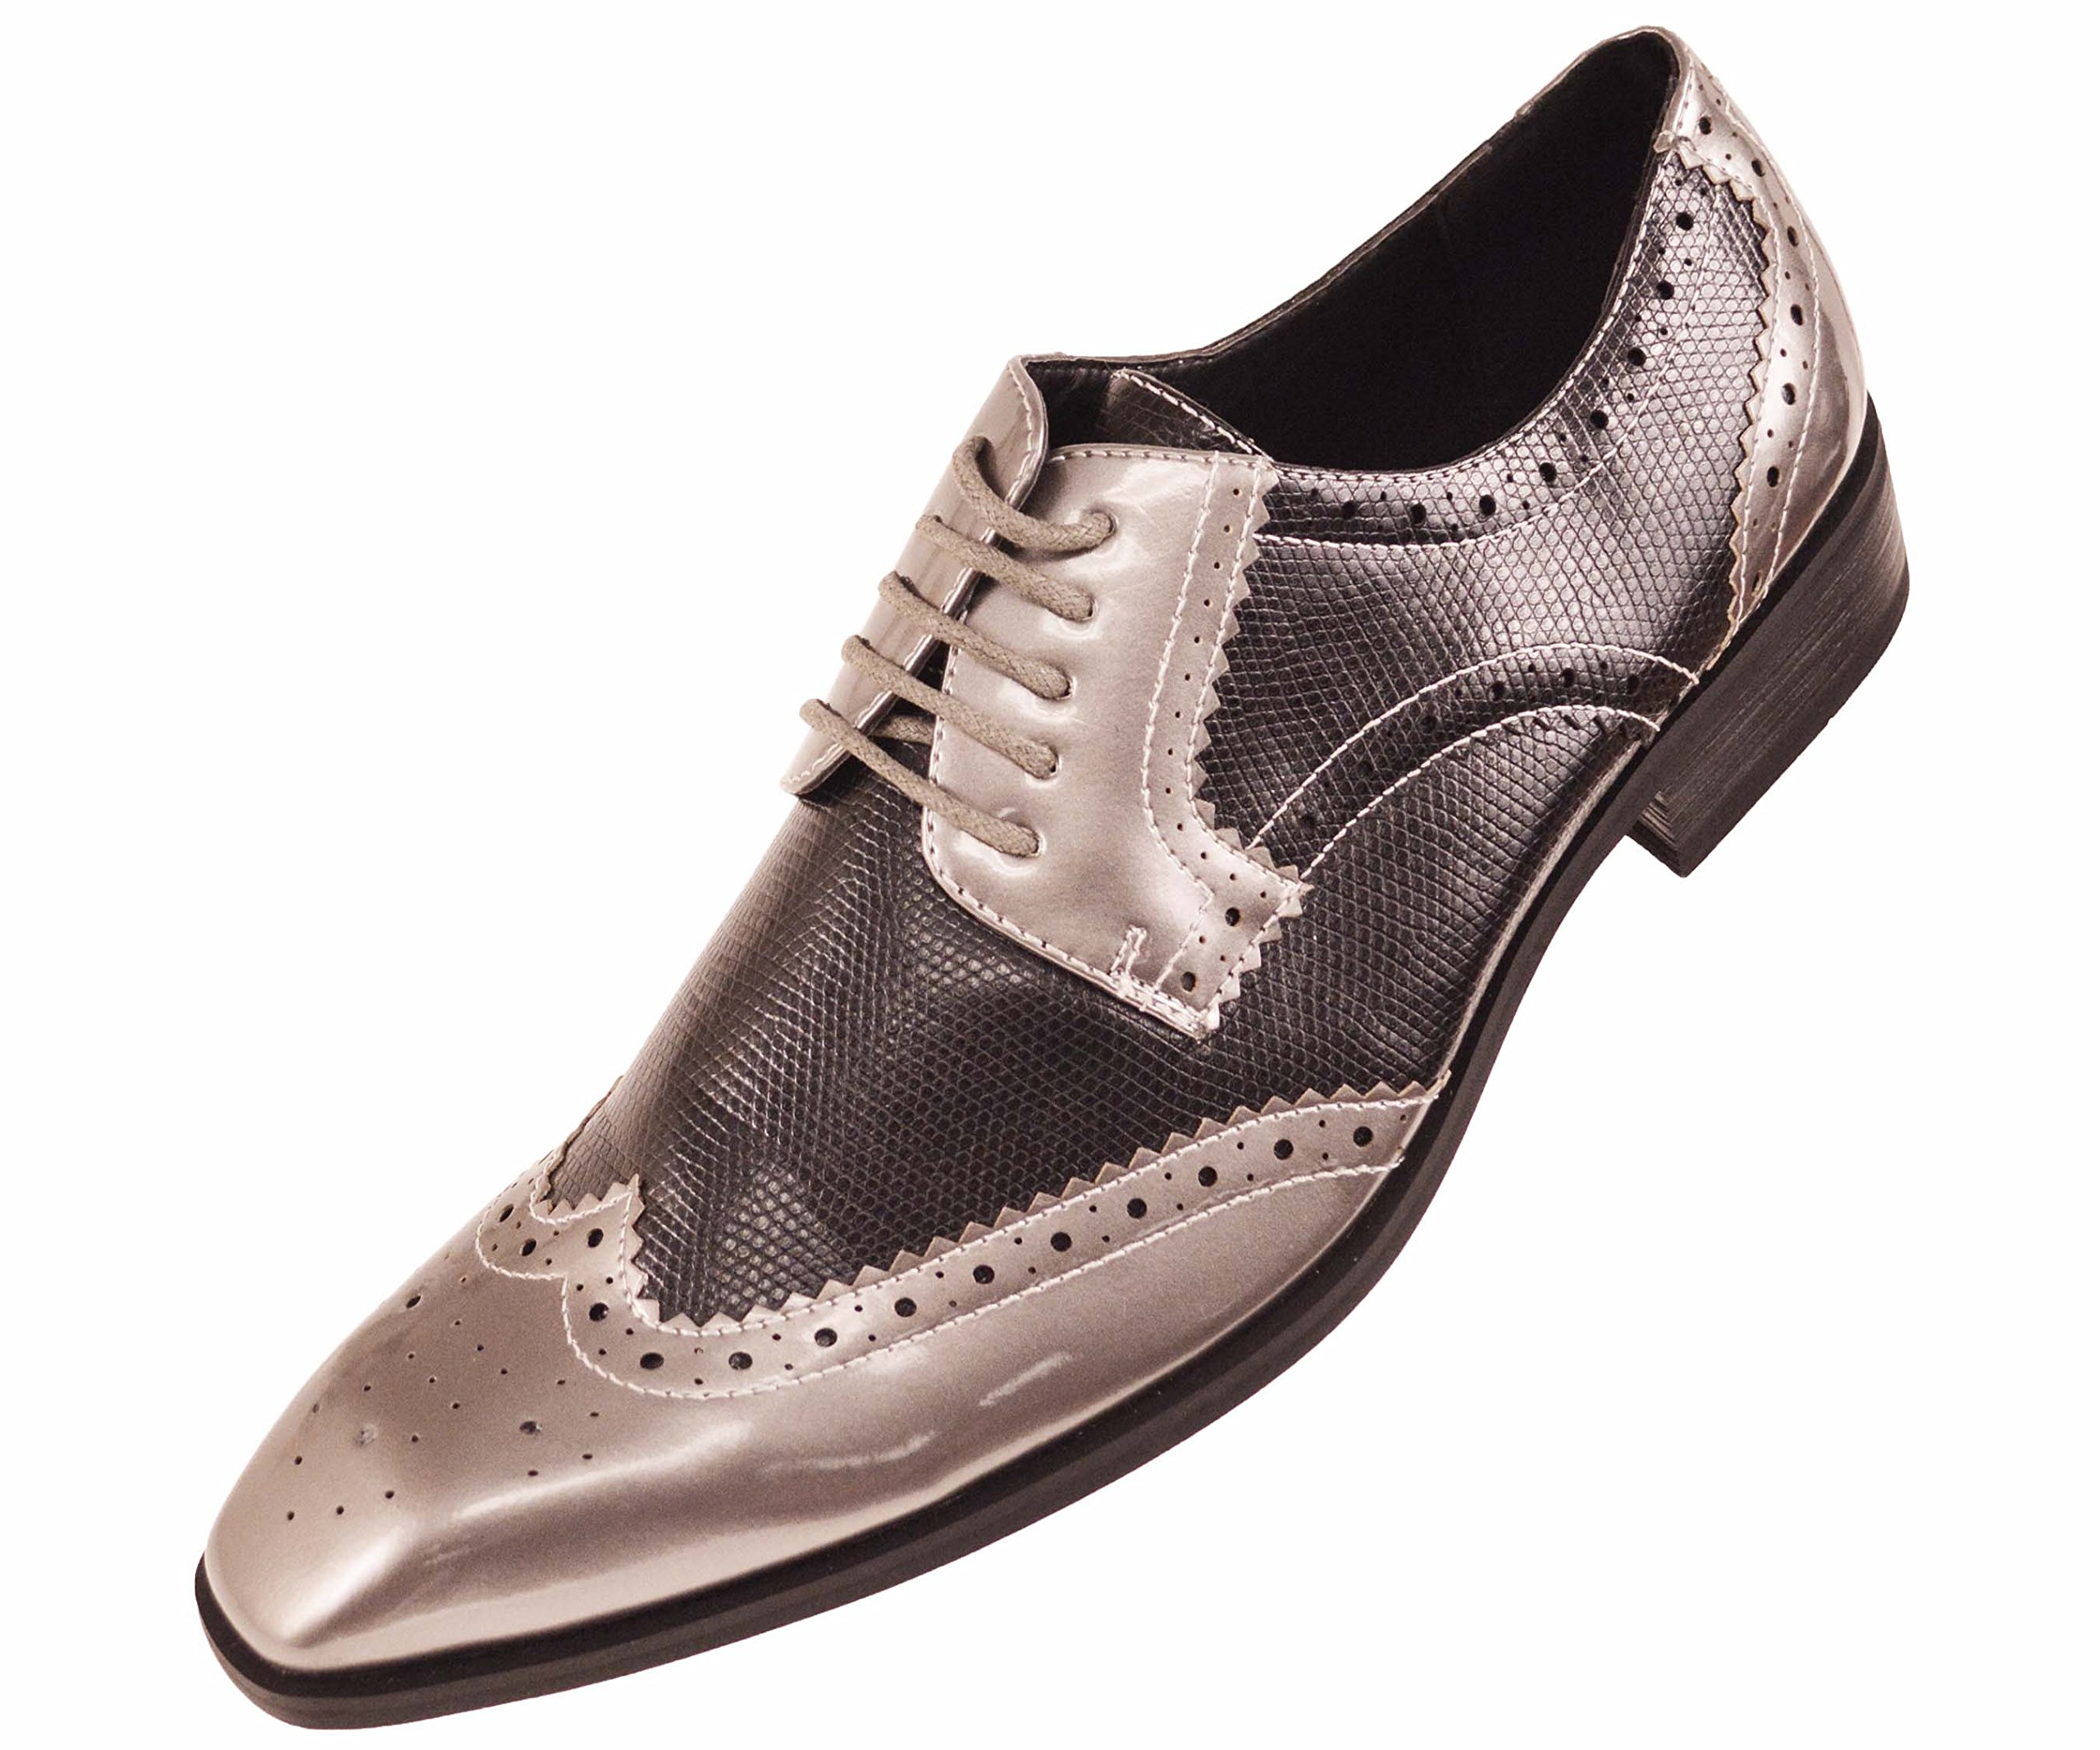 Amali Mens Two Tone Metallic Faux Lizard Skin Wingtip, Comfortable Lace-Up Oxford Tuxedo Dress Shoe